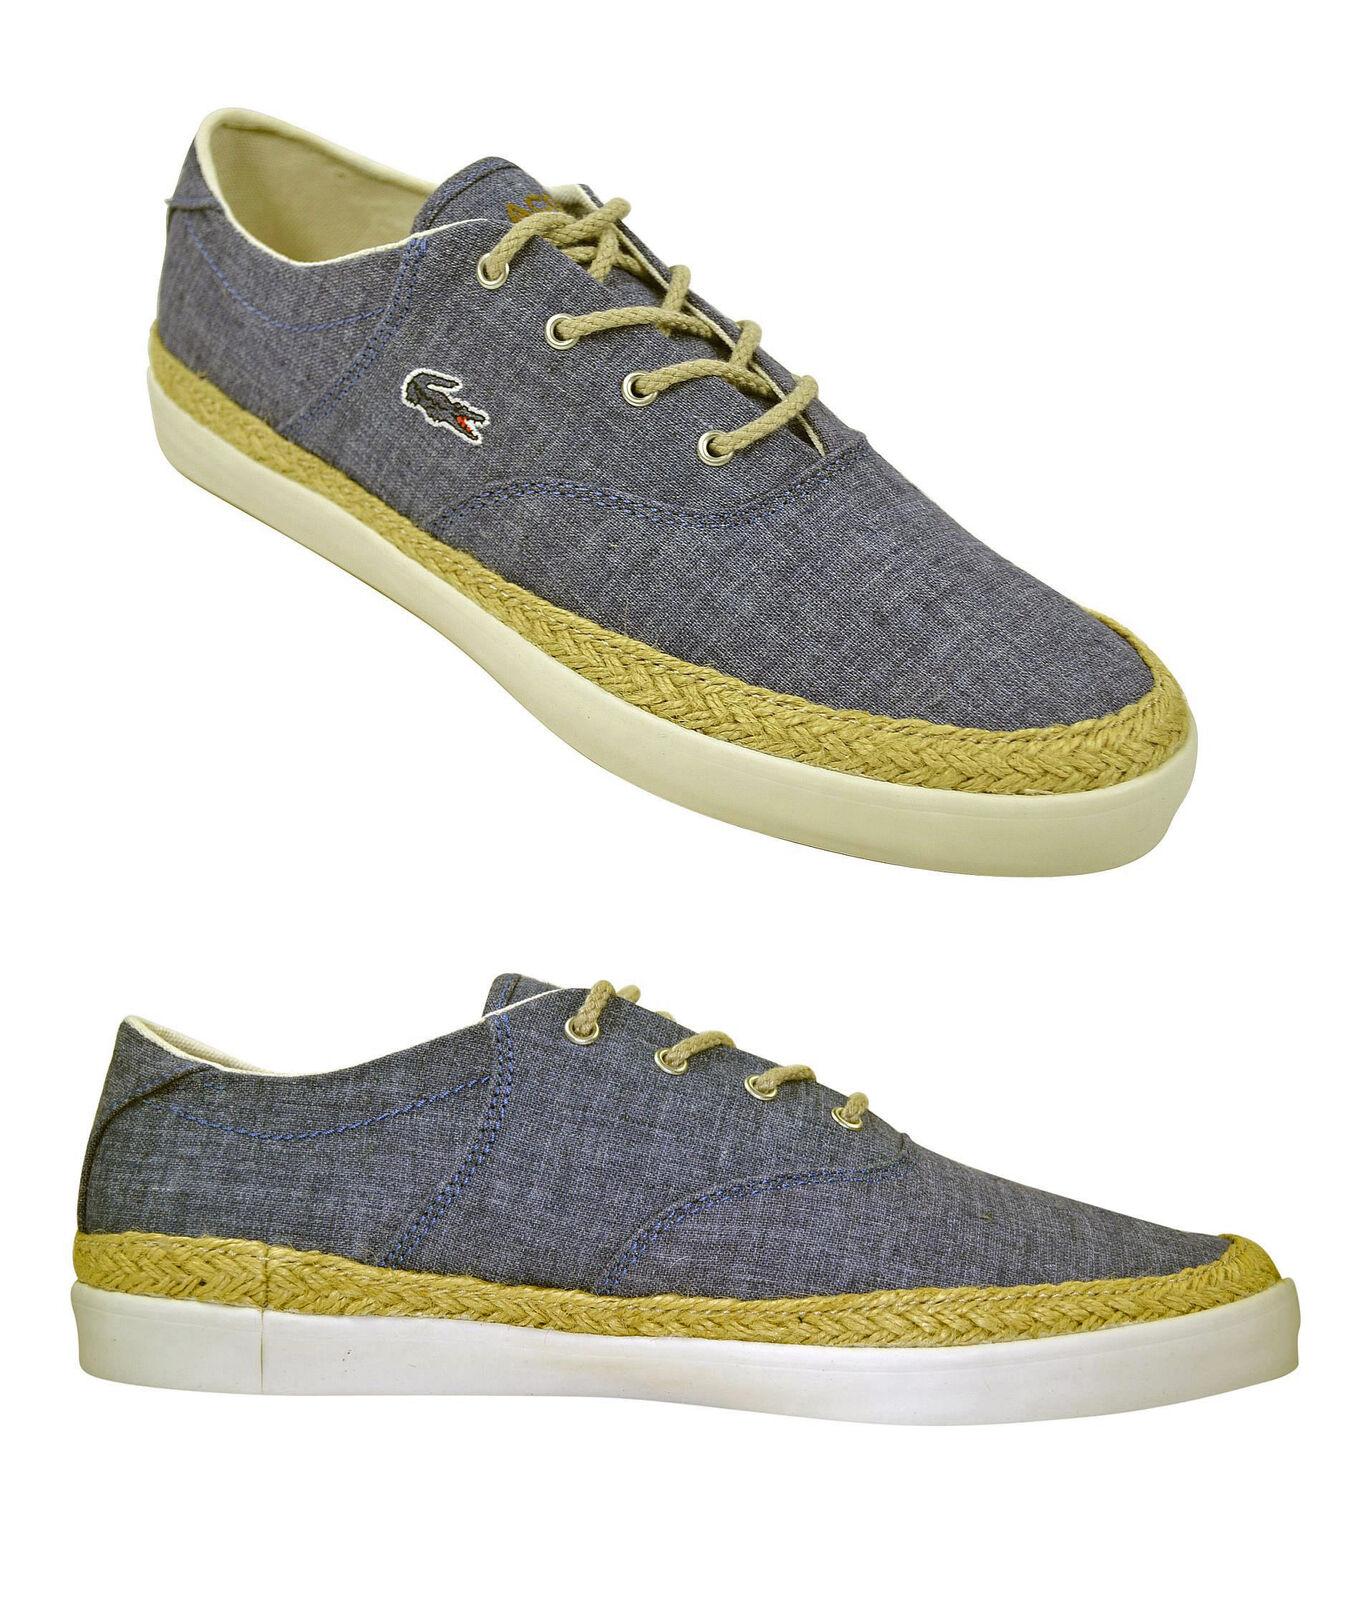 Lacoste Glendon Espa W SRW Blau Schuhe Sneaker blau